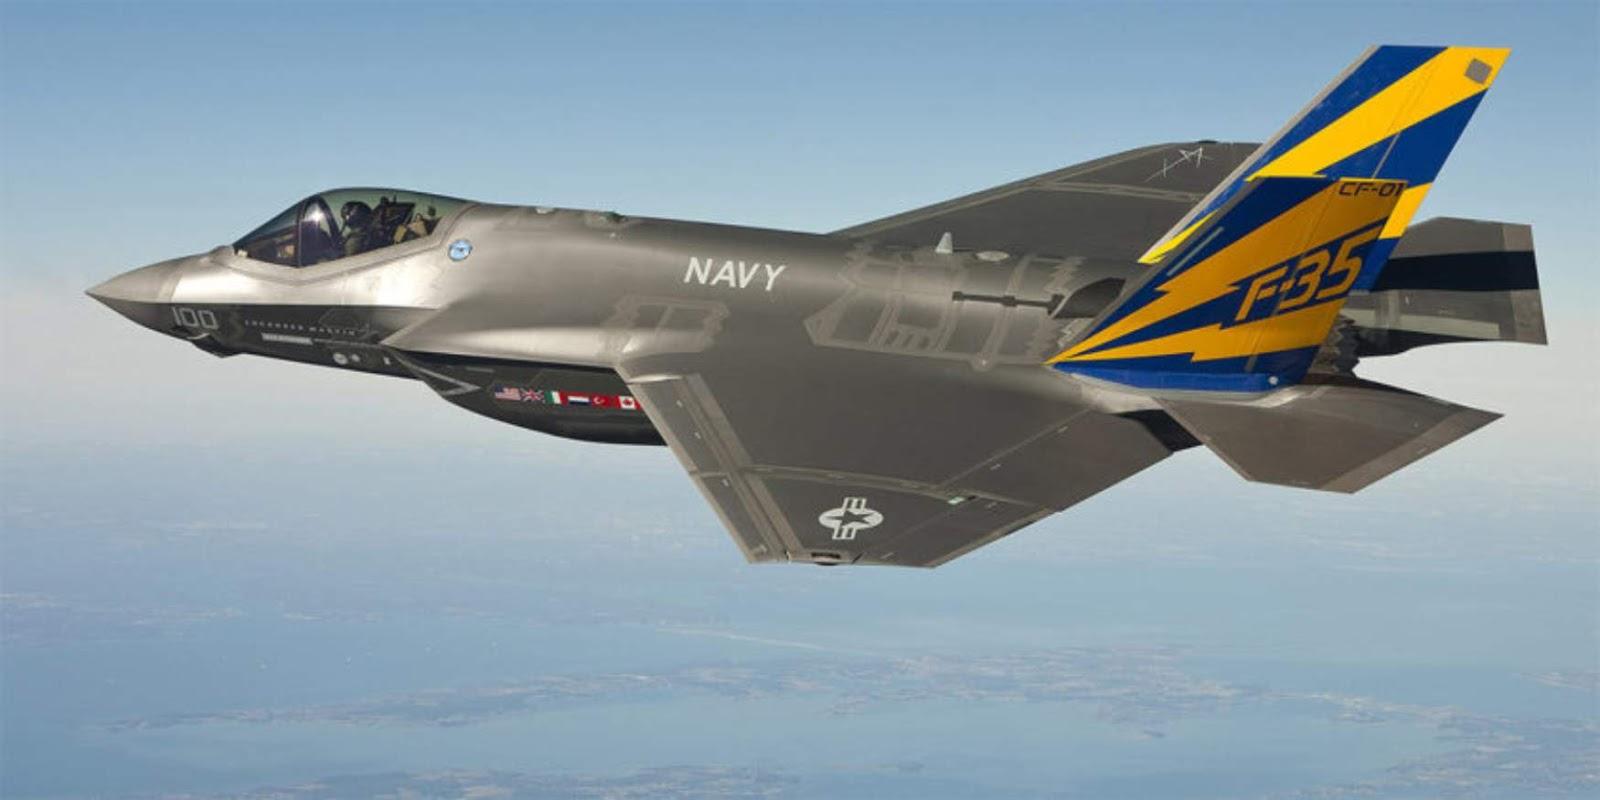 Puluhan pesawat tempur F-35 kembali di tangguhkan penerbangannya